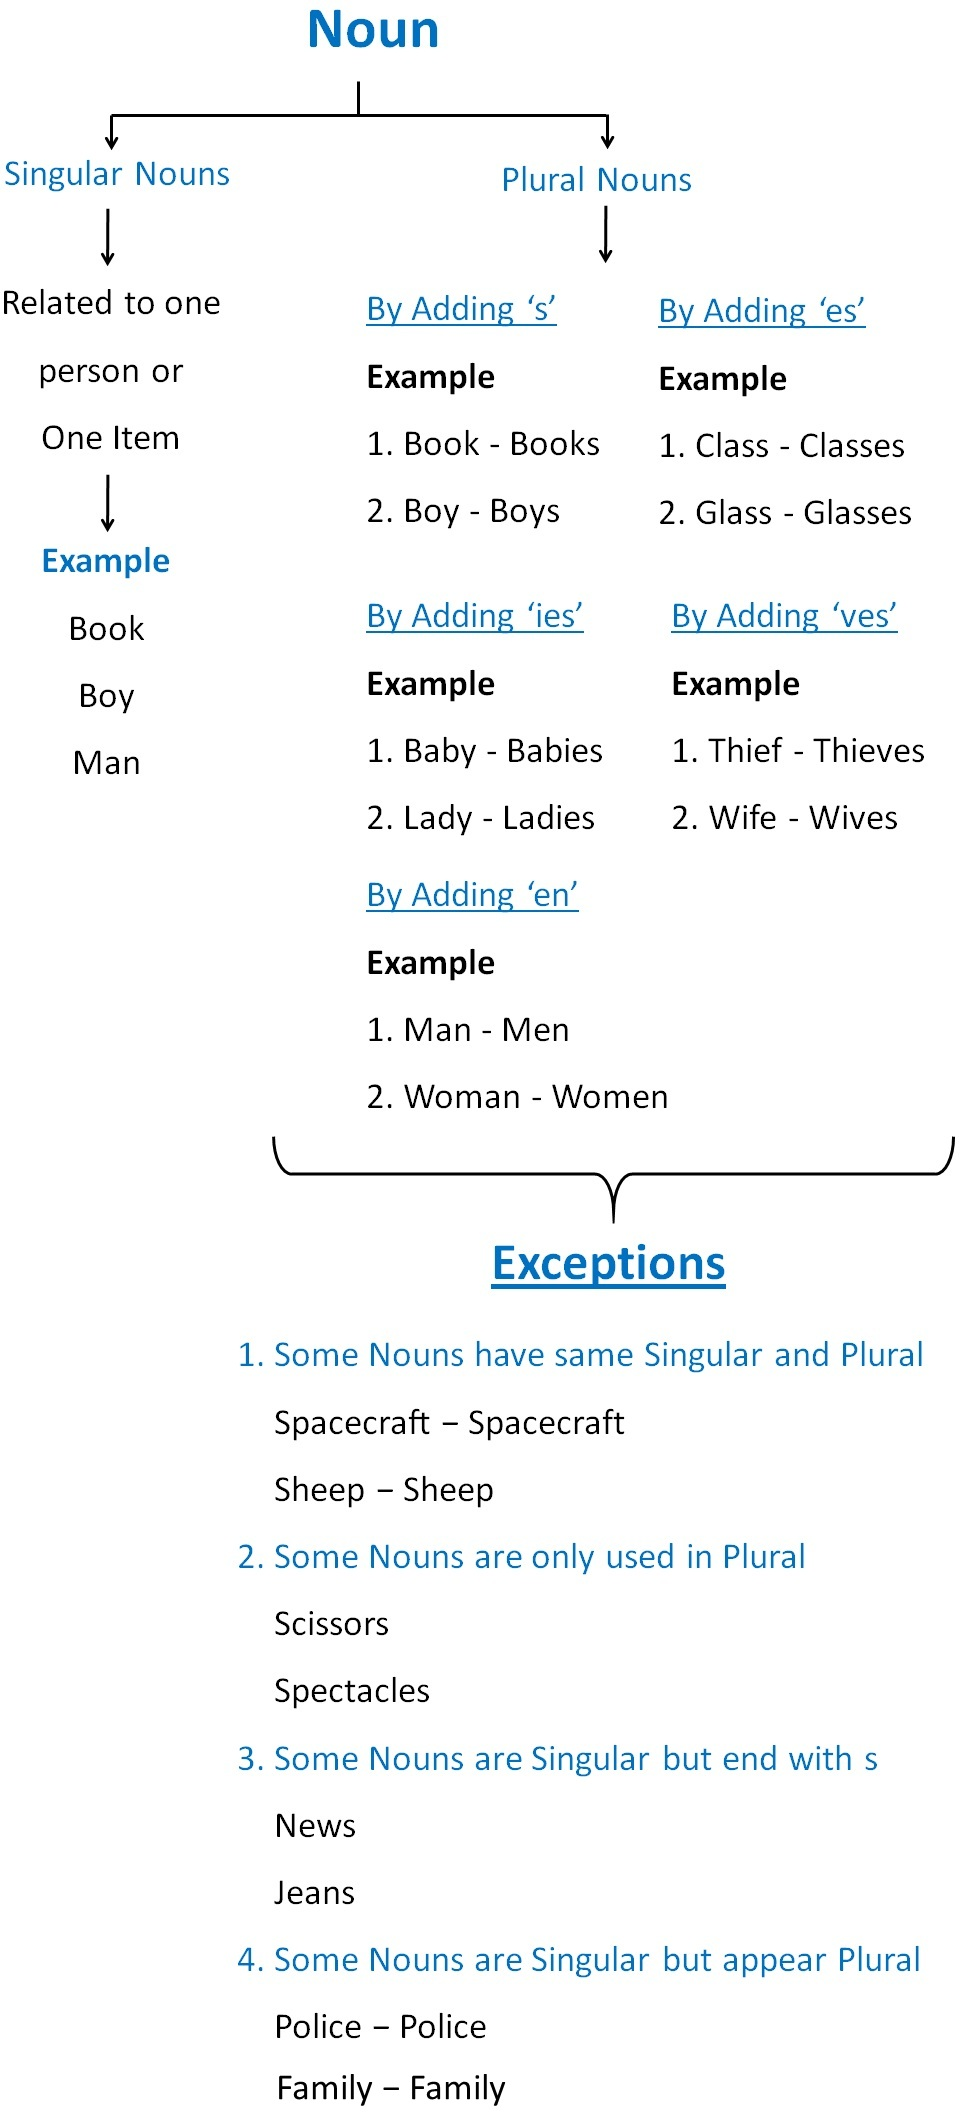 Singular and plural nouns s, es, ies, etc.jpg